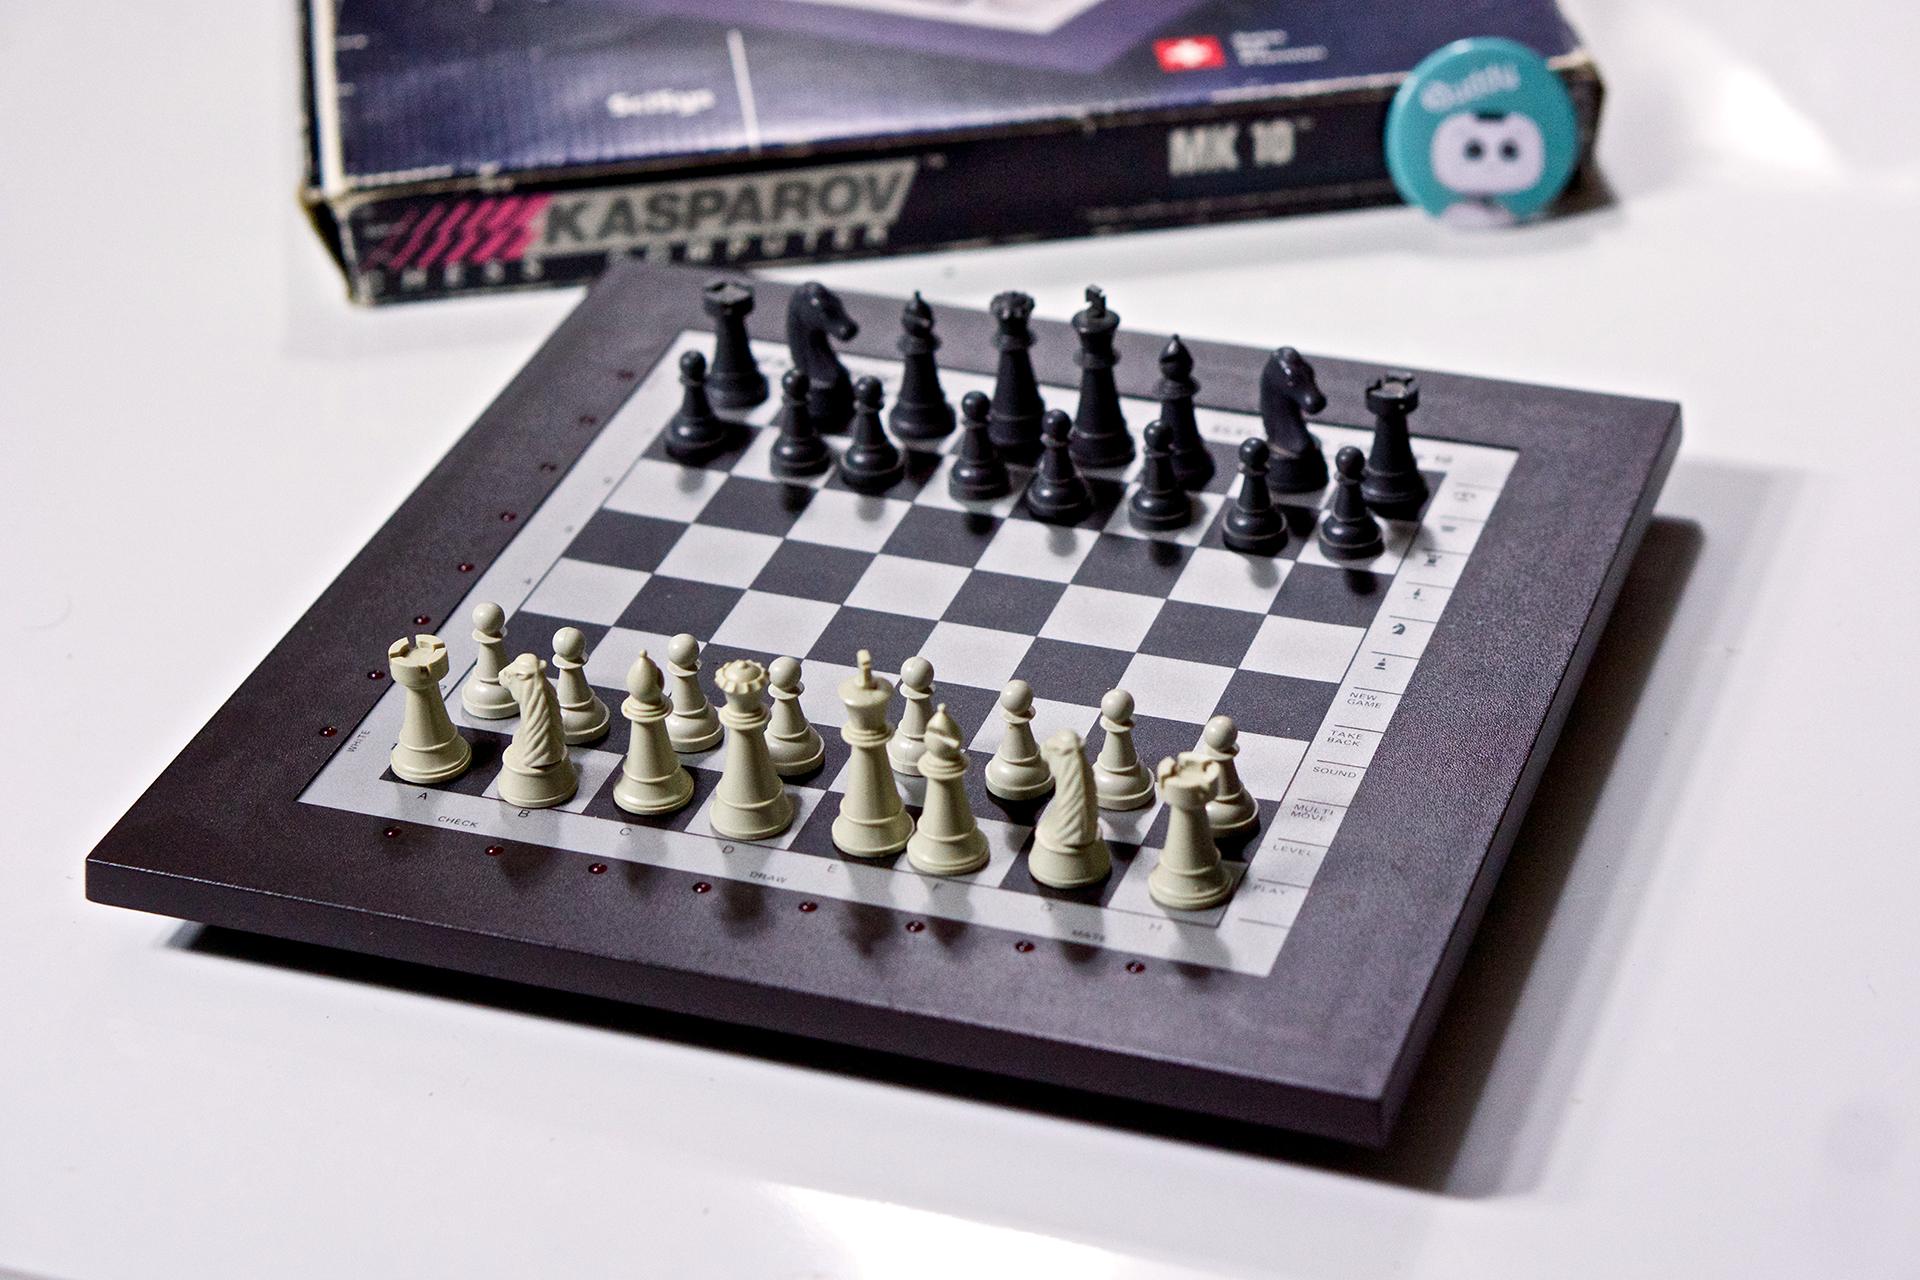 Kasparov Chess Computer MK 10